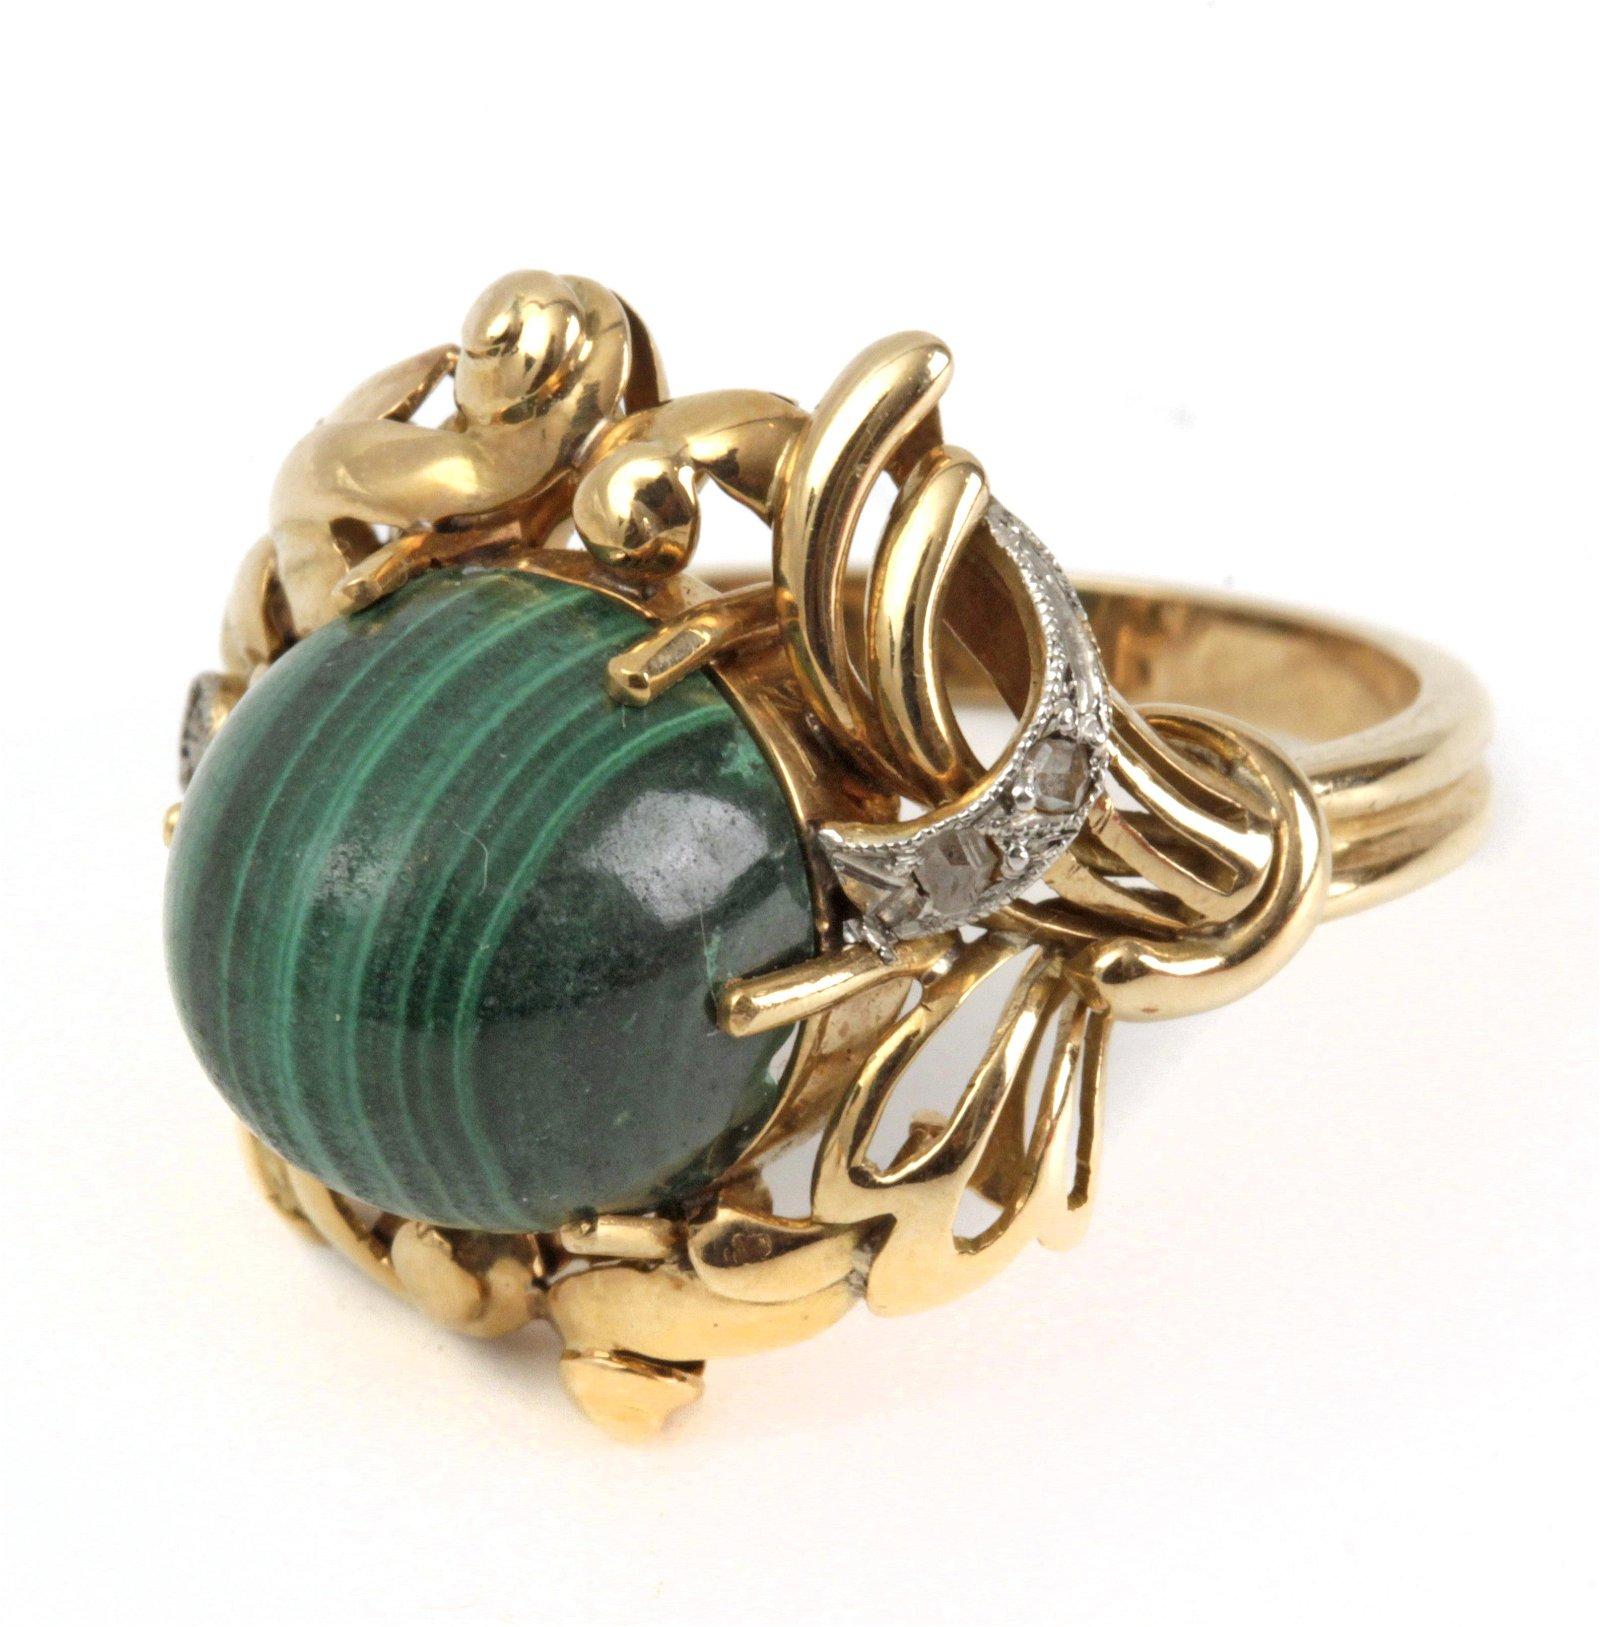 A ring circa 1950. Gold, rose cut diamonds and a